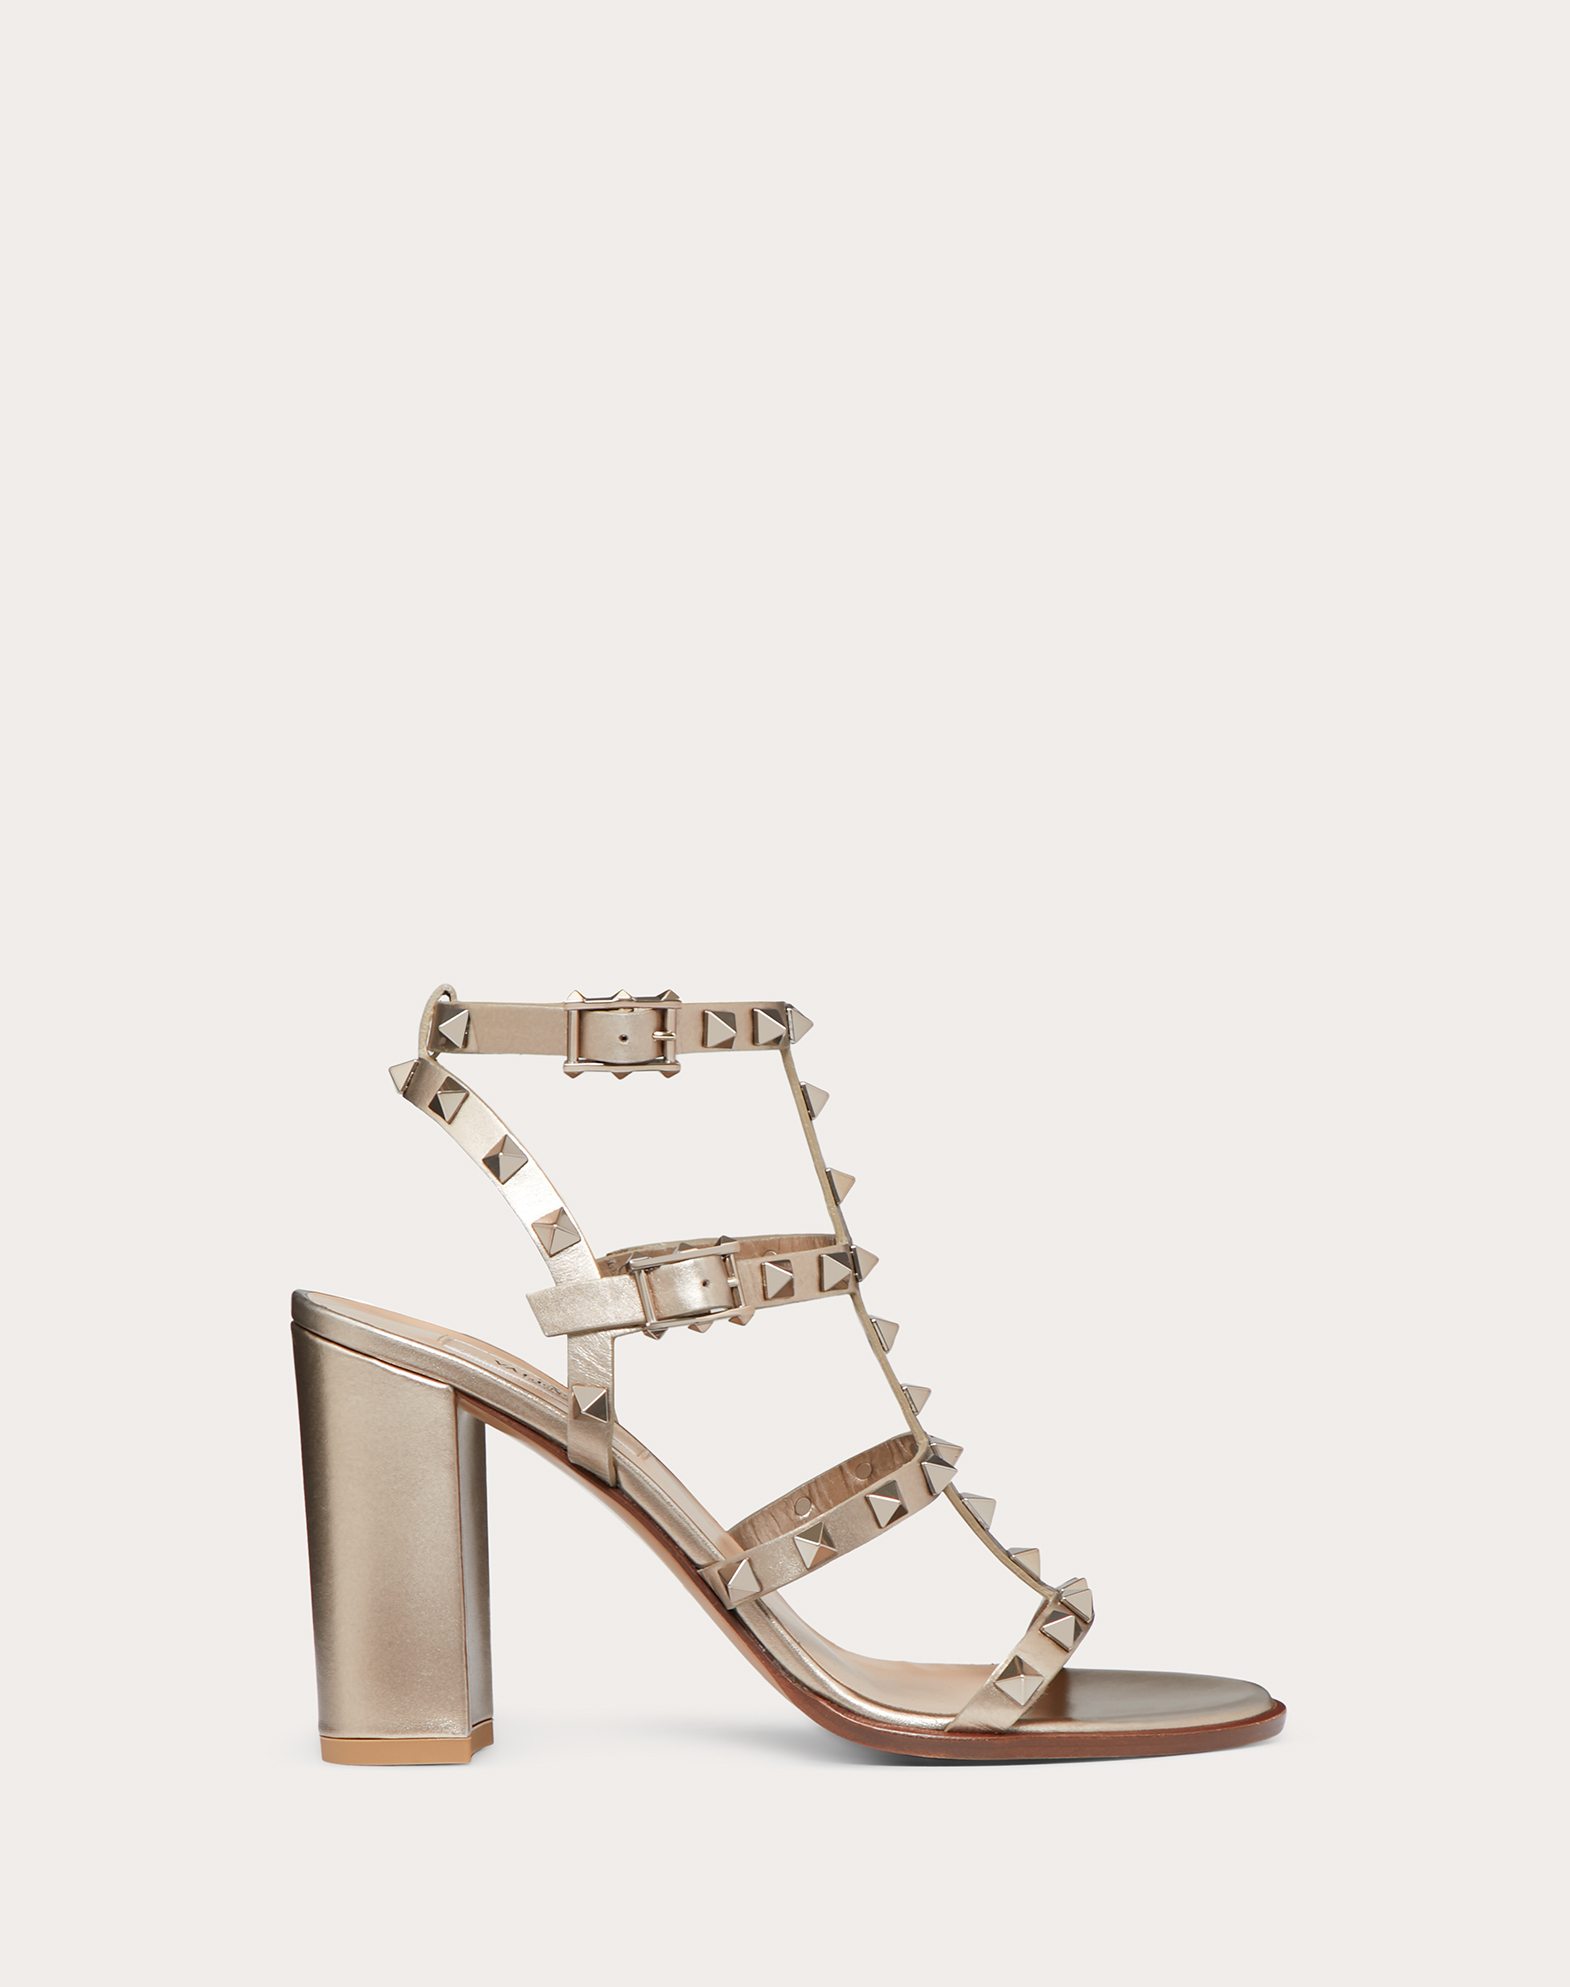 Rockstud  Metallic Calfskin Ankle Strap Sandal 90 mm